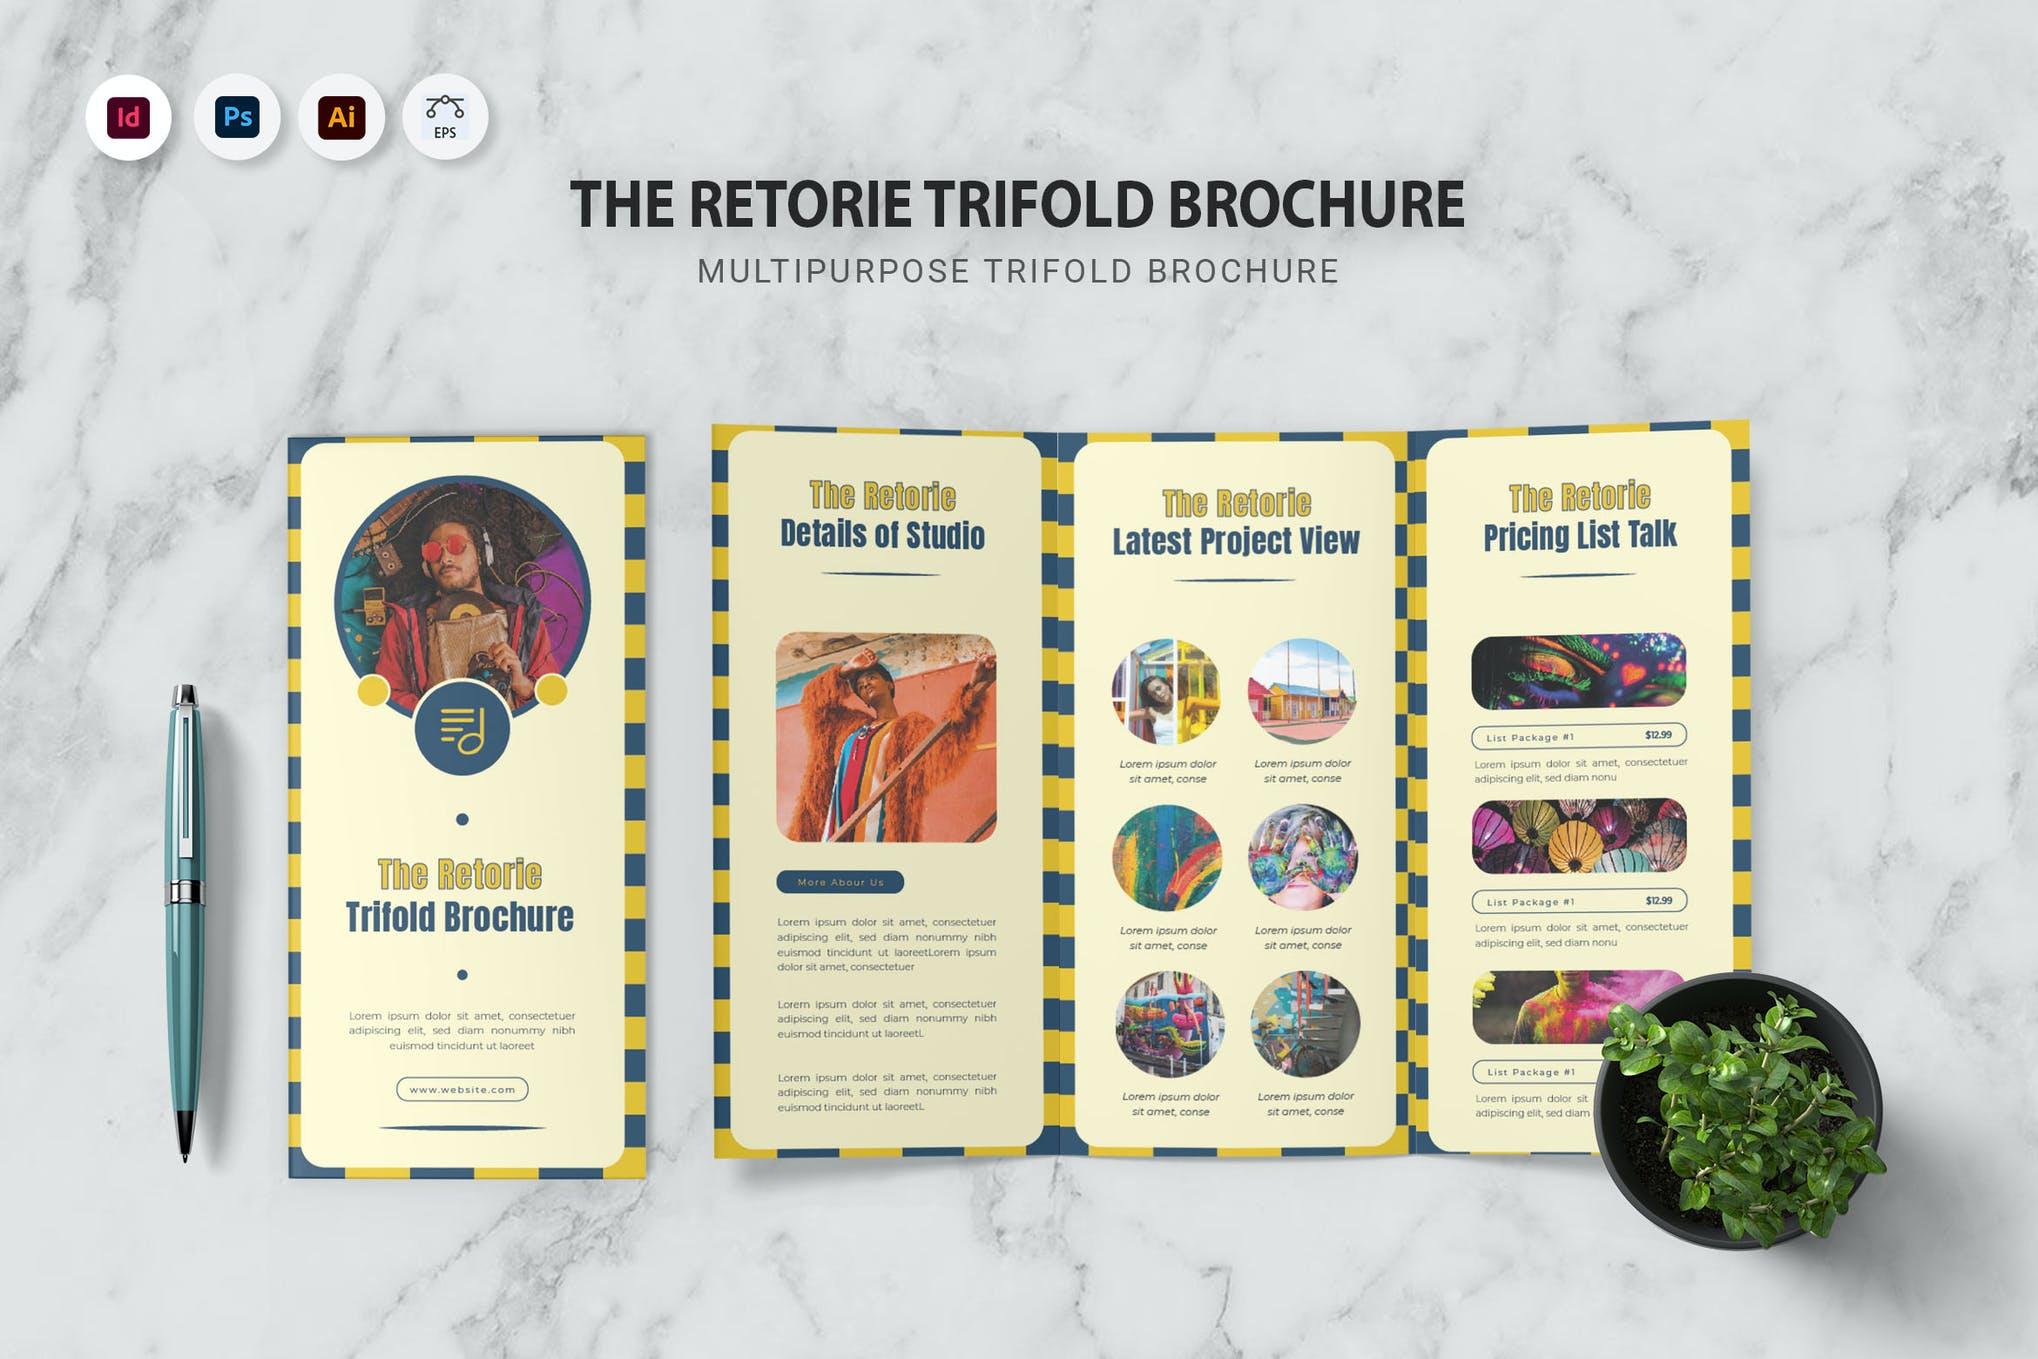 The Retorie Trifold Brochure